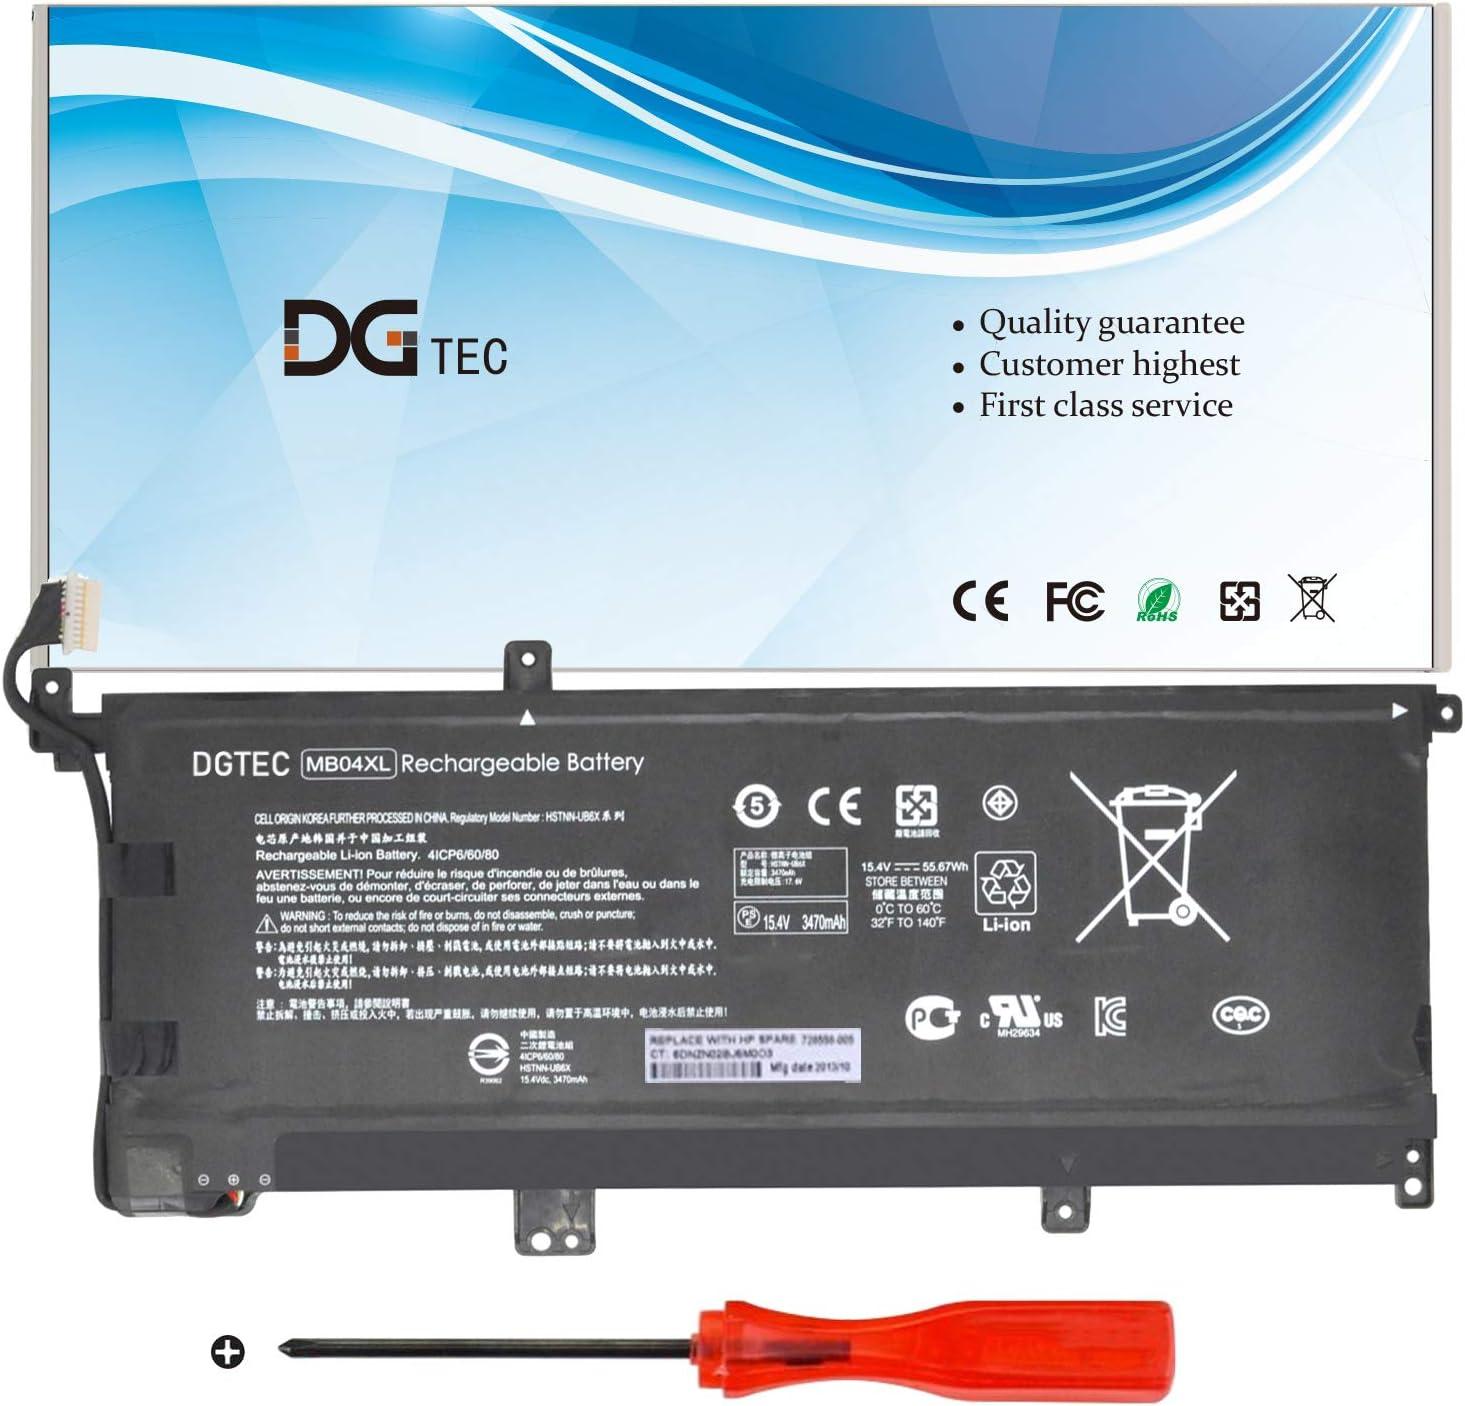 DGTEC New MB04XL Laptop Battery Replacement for HP Envy x360 M6-AQ105DX M6-AQ003DX M6-AQ005DX M6-AR004DX AQ103DX Convertible PC 15 15-AQ005NA HSTNN-UB6X 843538-541 844204-850(11.5V 55.67Wh)